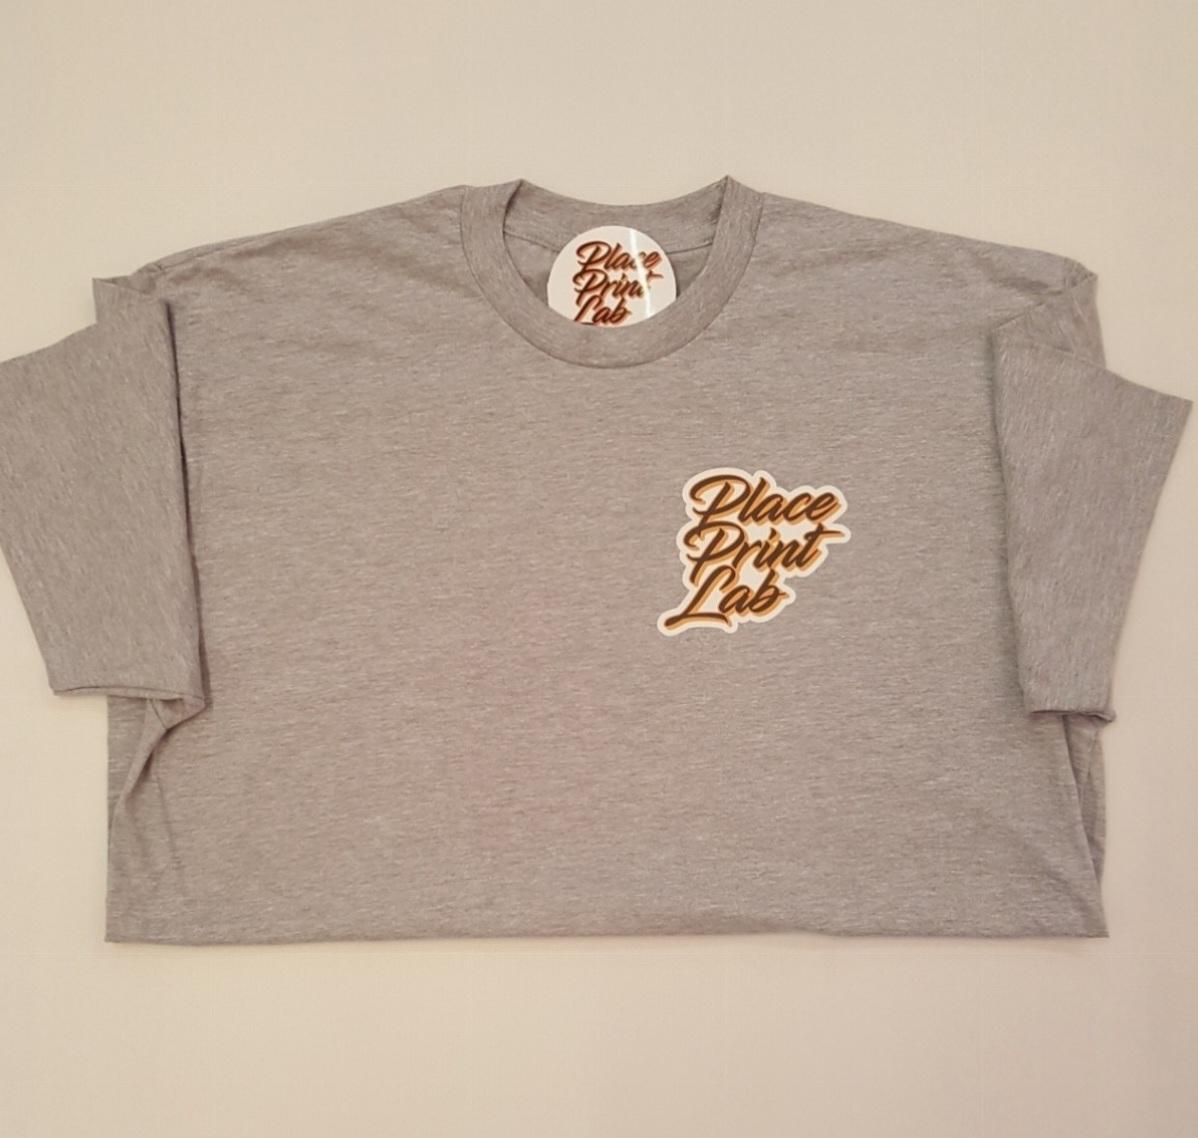 Place Print Lab T shirt